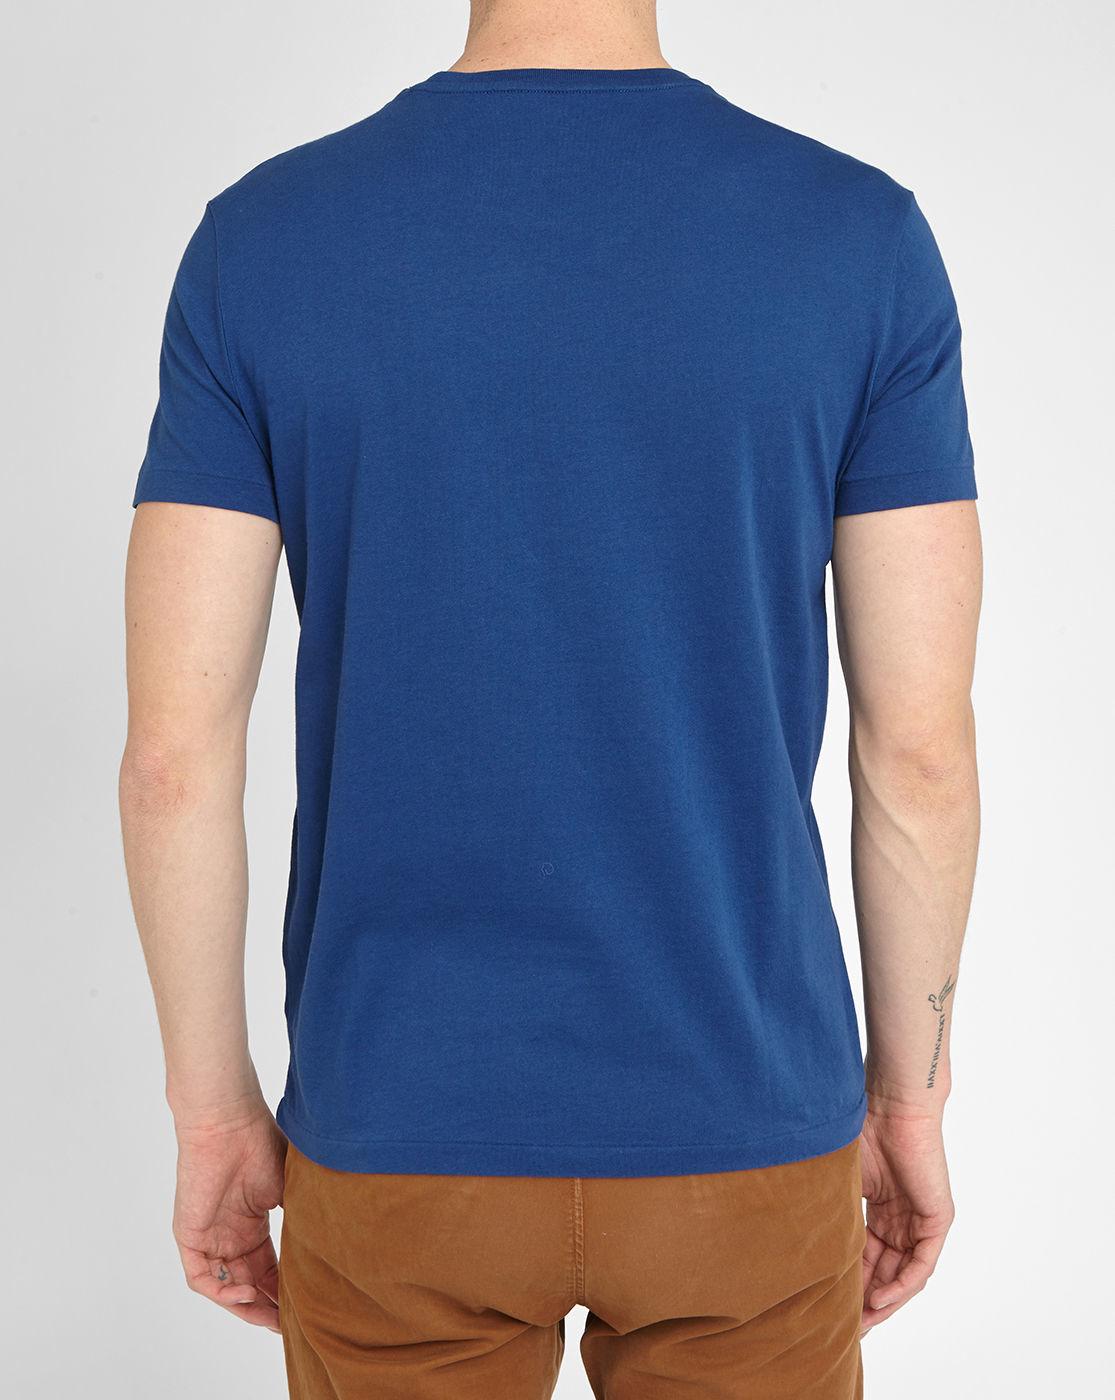 polo ralph lauren royal blue pr custom fit t shirt in blue. Black Bedroom Furniture Sets. Home Design Ideas